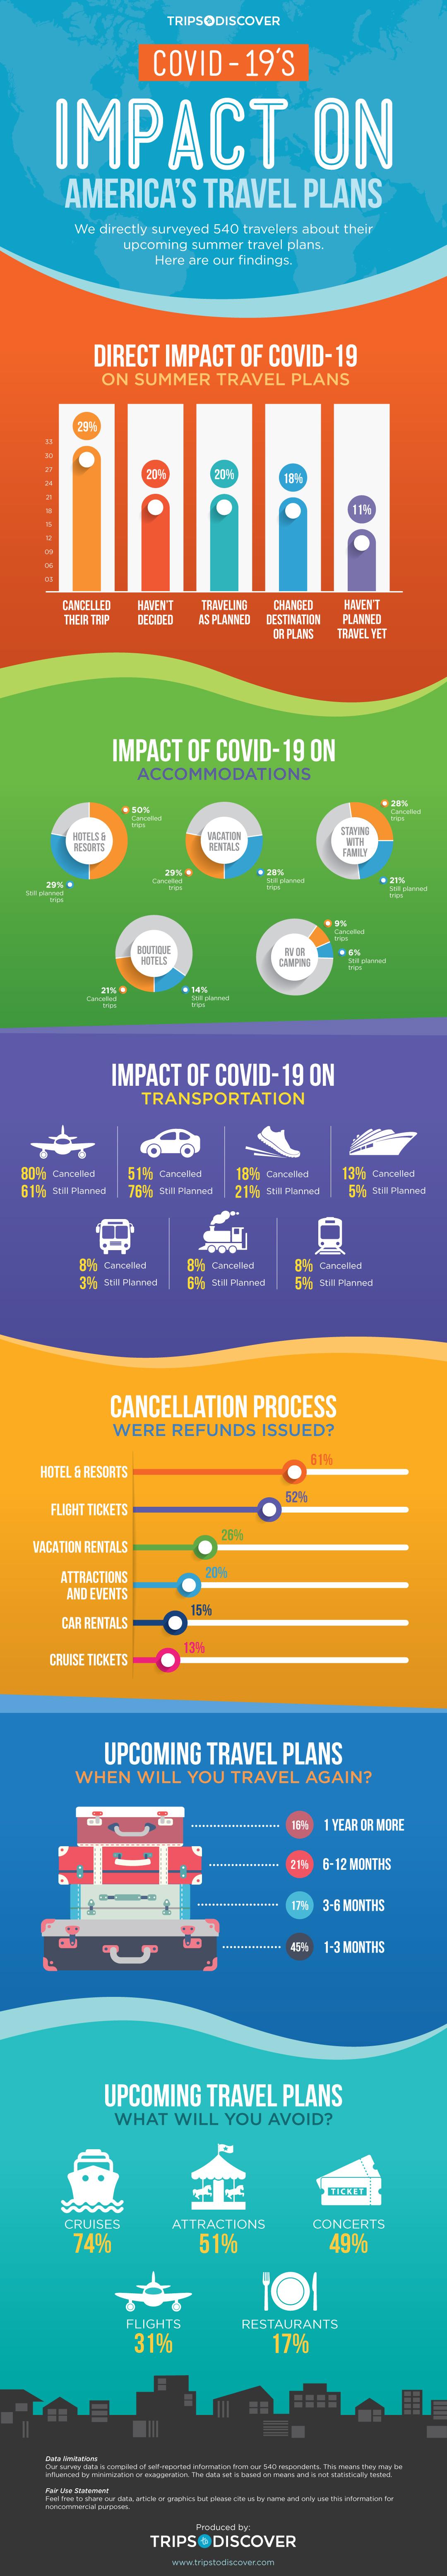 Covid19 Impact on Travel